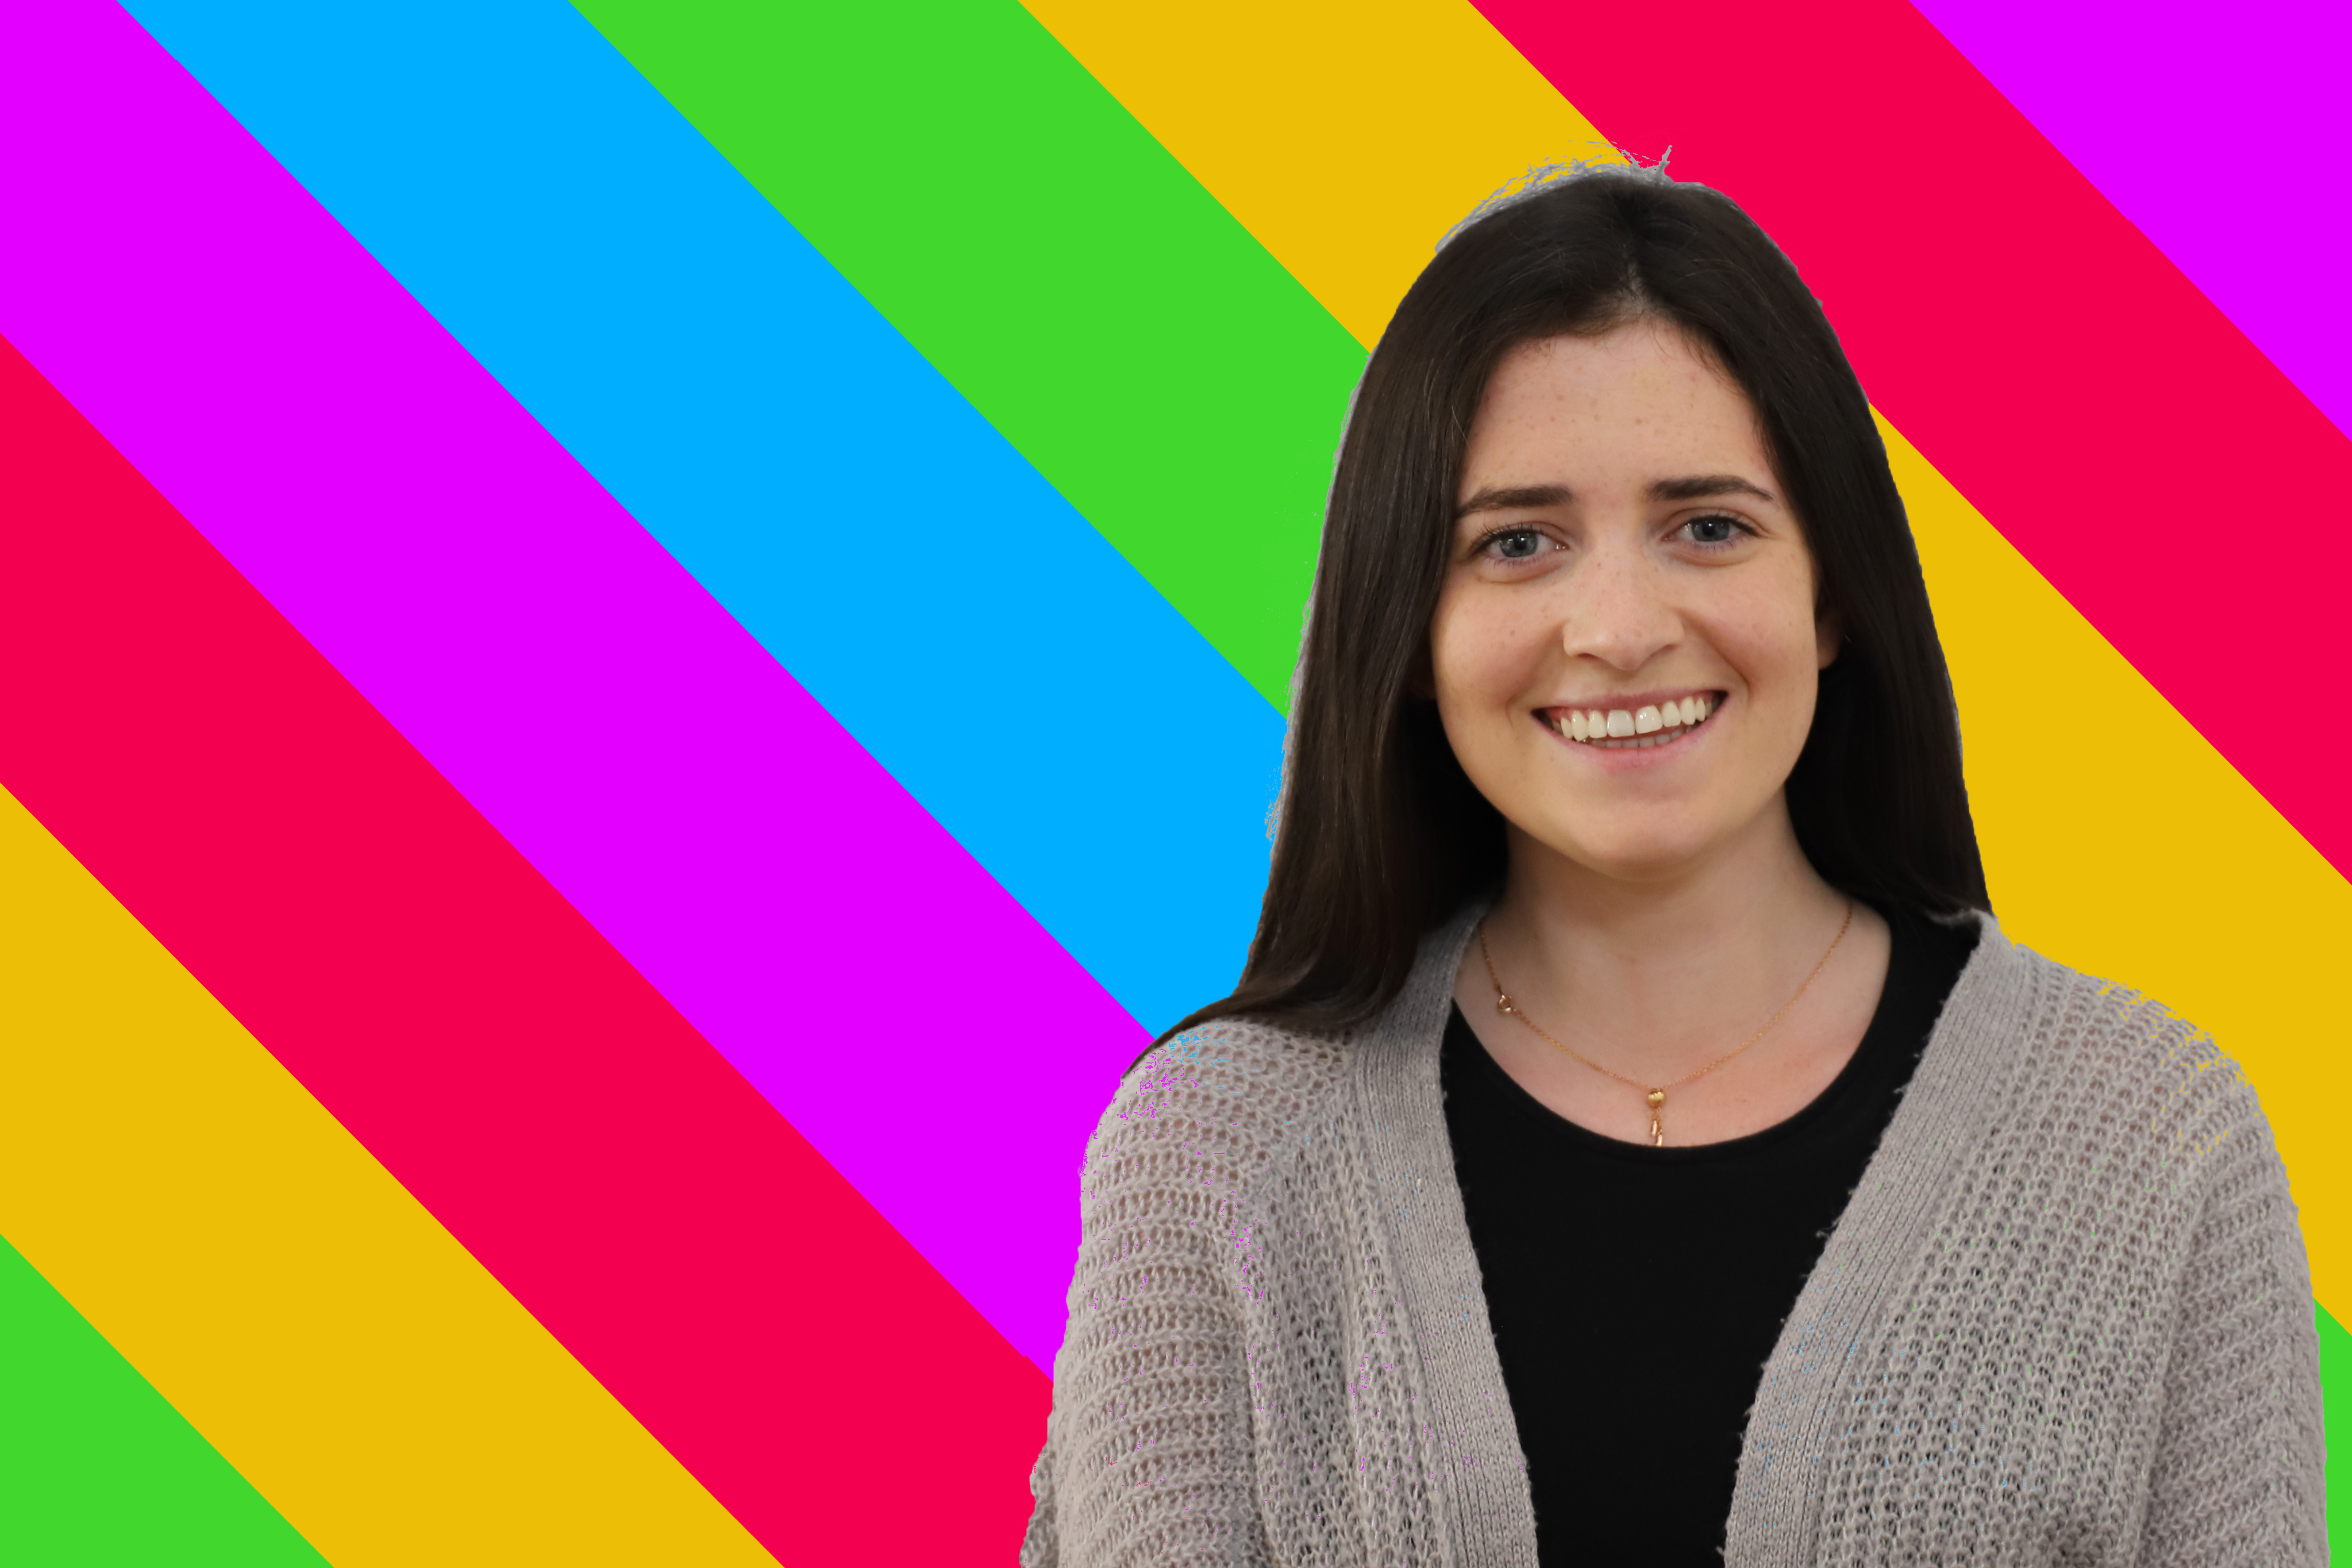 SMSU branded image of rainbow stripes